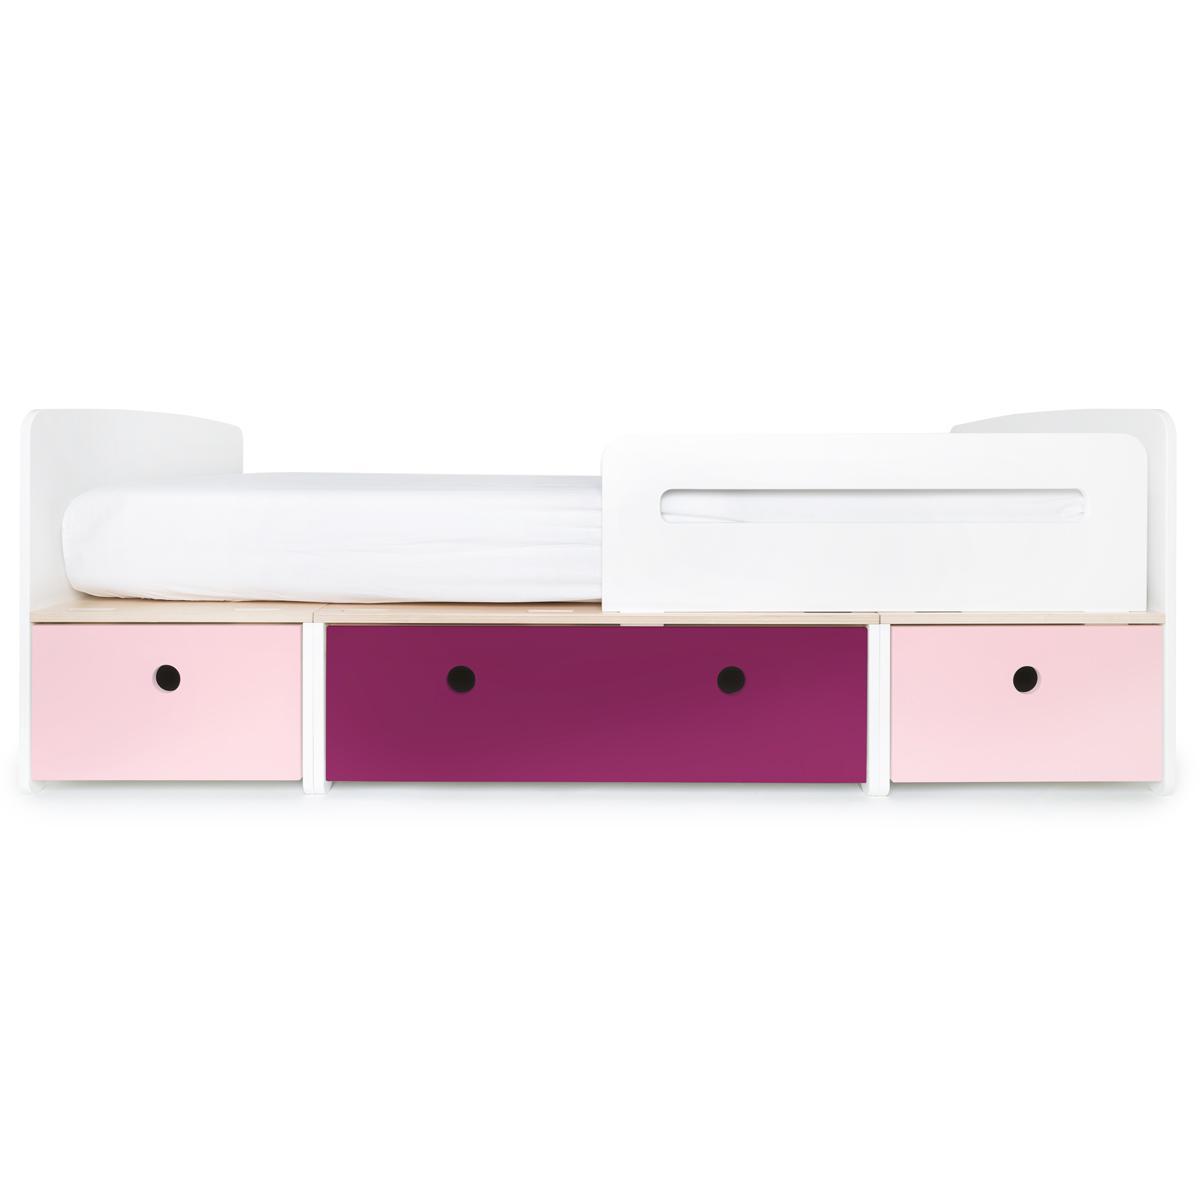 Lit évolutif 90x200cm COLORFLEX sweet pink-plum-sweet pink